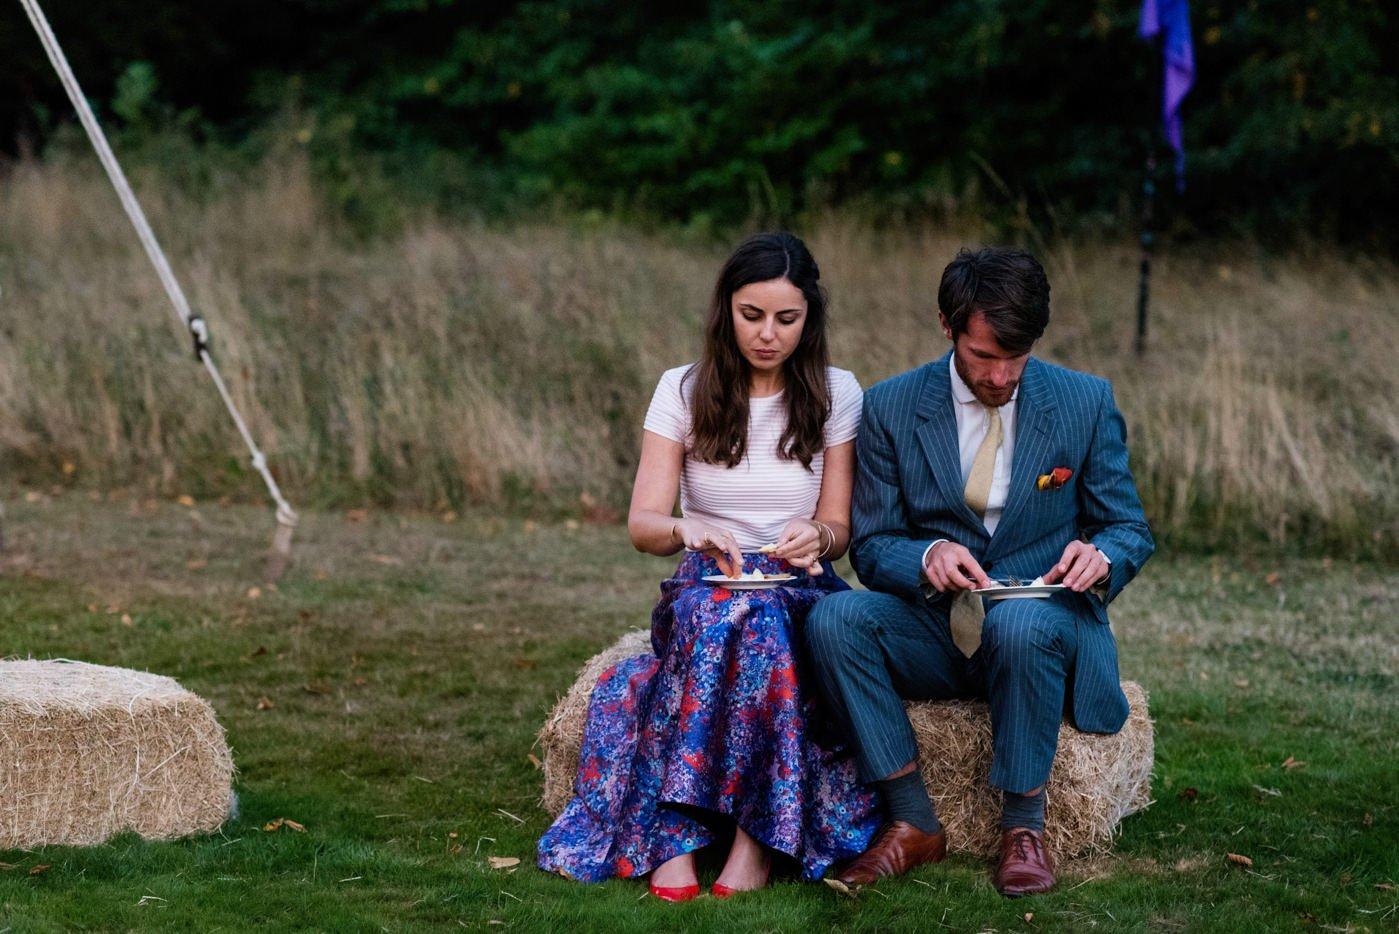 bignor-park-wedding-photography-robyn-and-tom-112